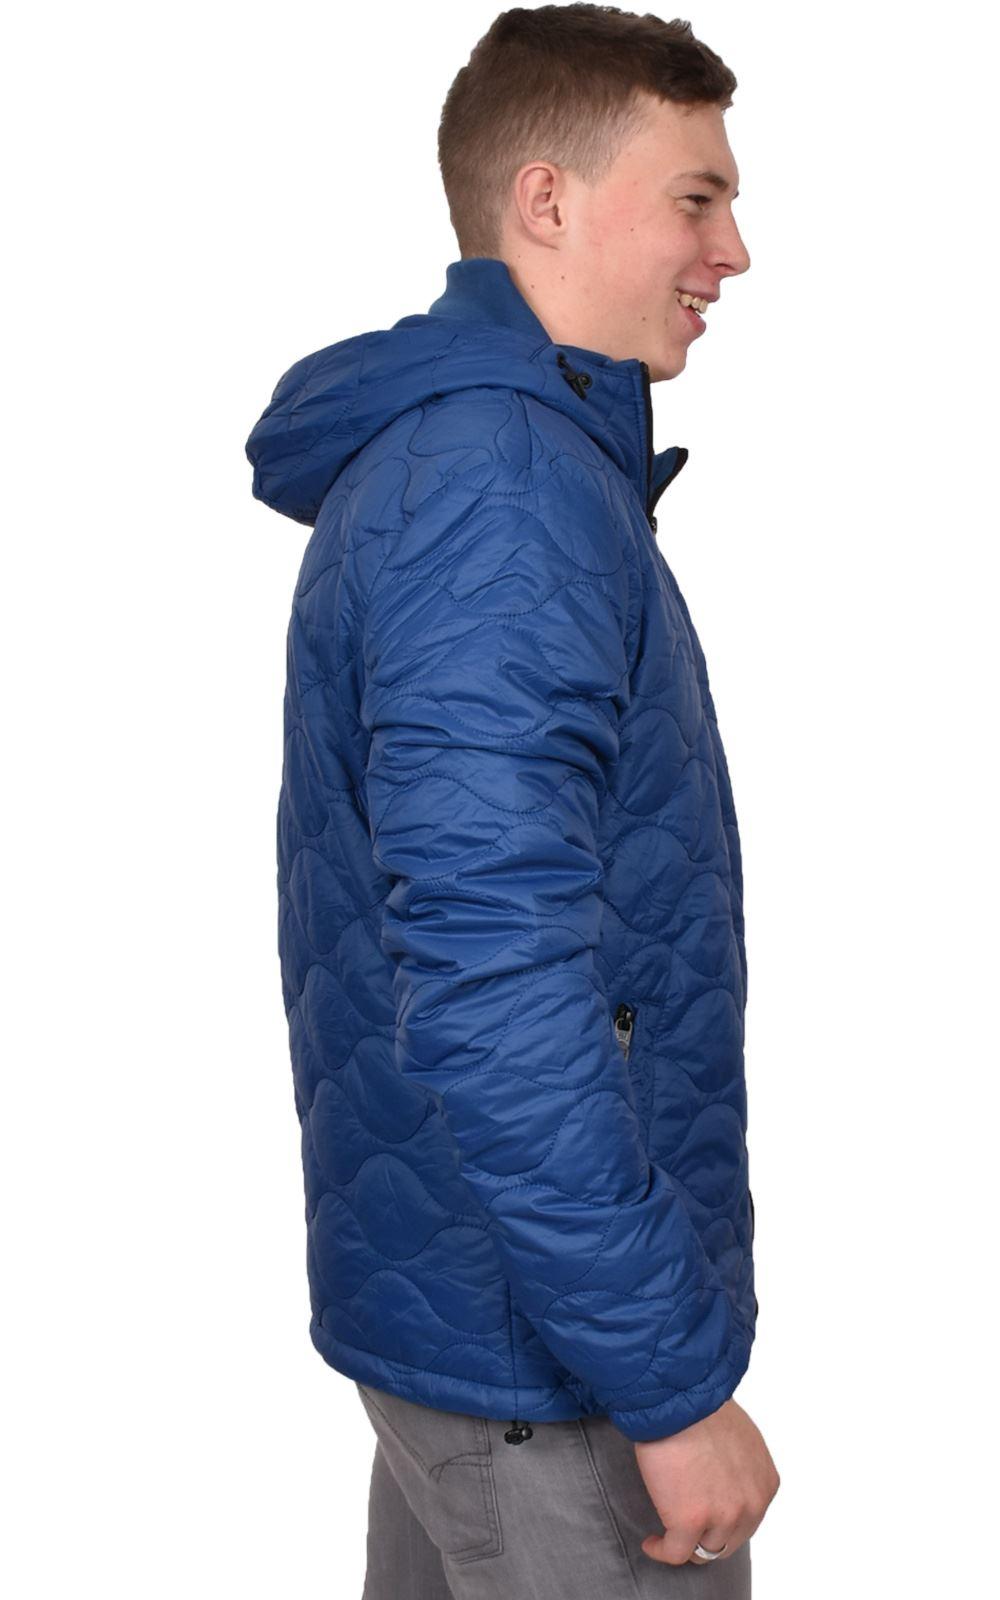 Mens-Smith-amp-Jones-Jacket-Full-Zip-Fleece-Lined-Hooded-Light-Weight-Warm-Coat thumbnail 9